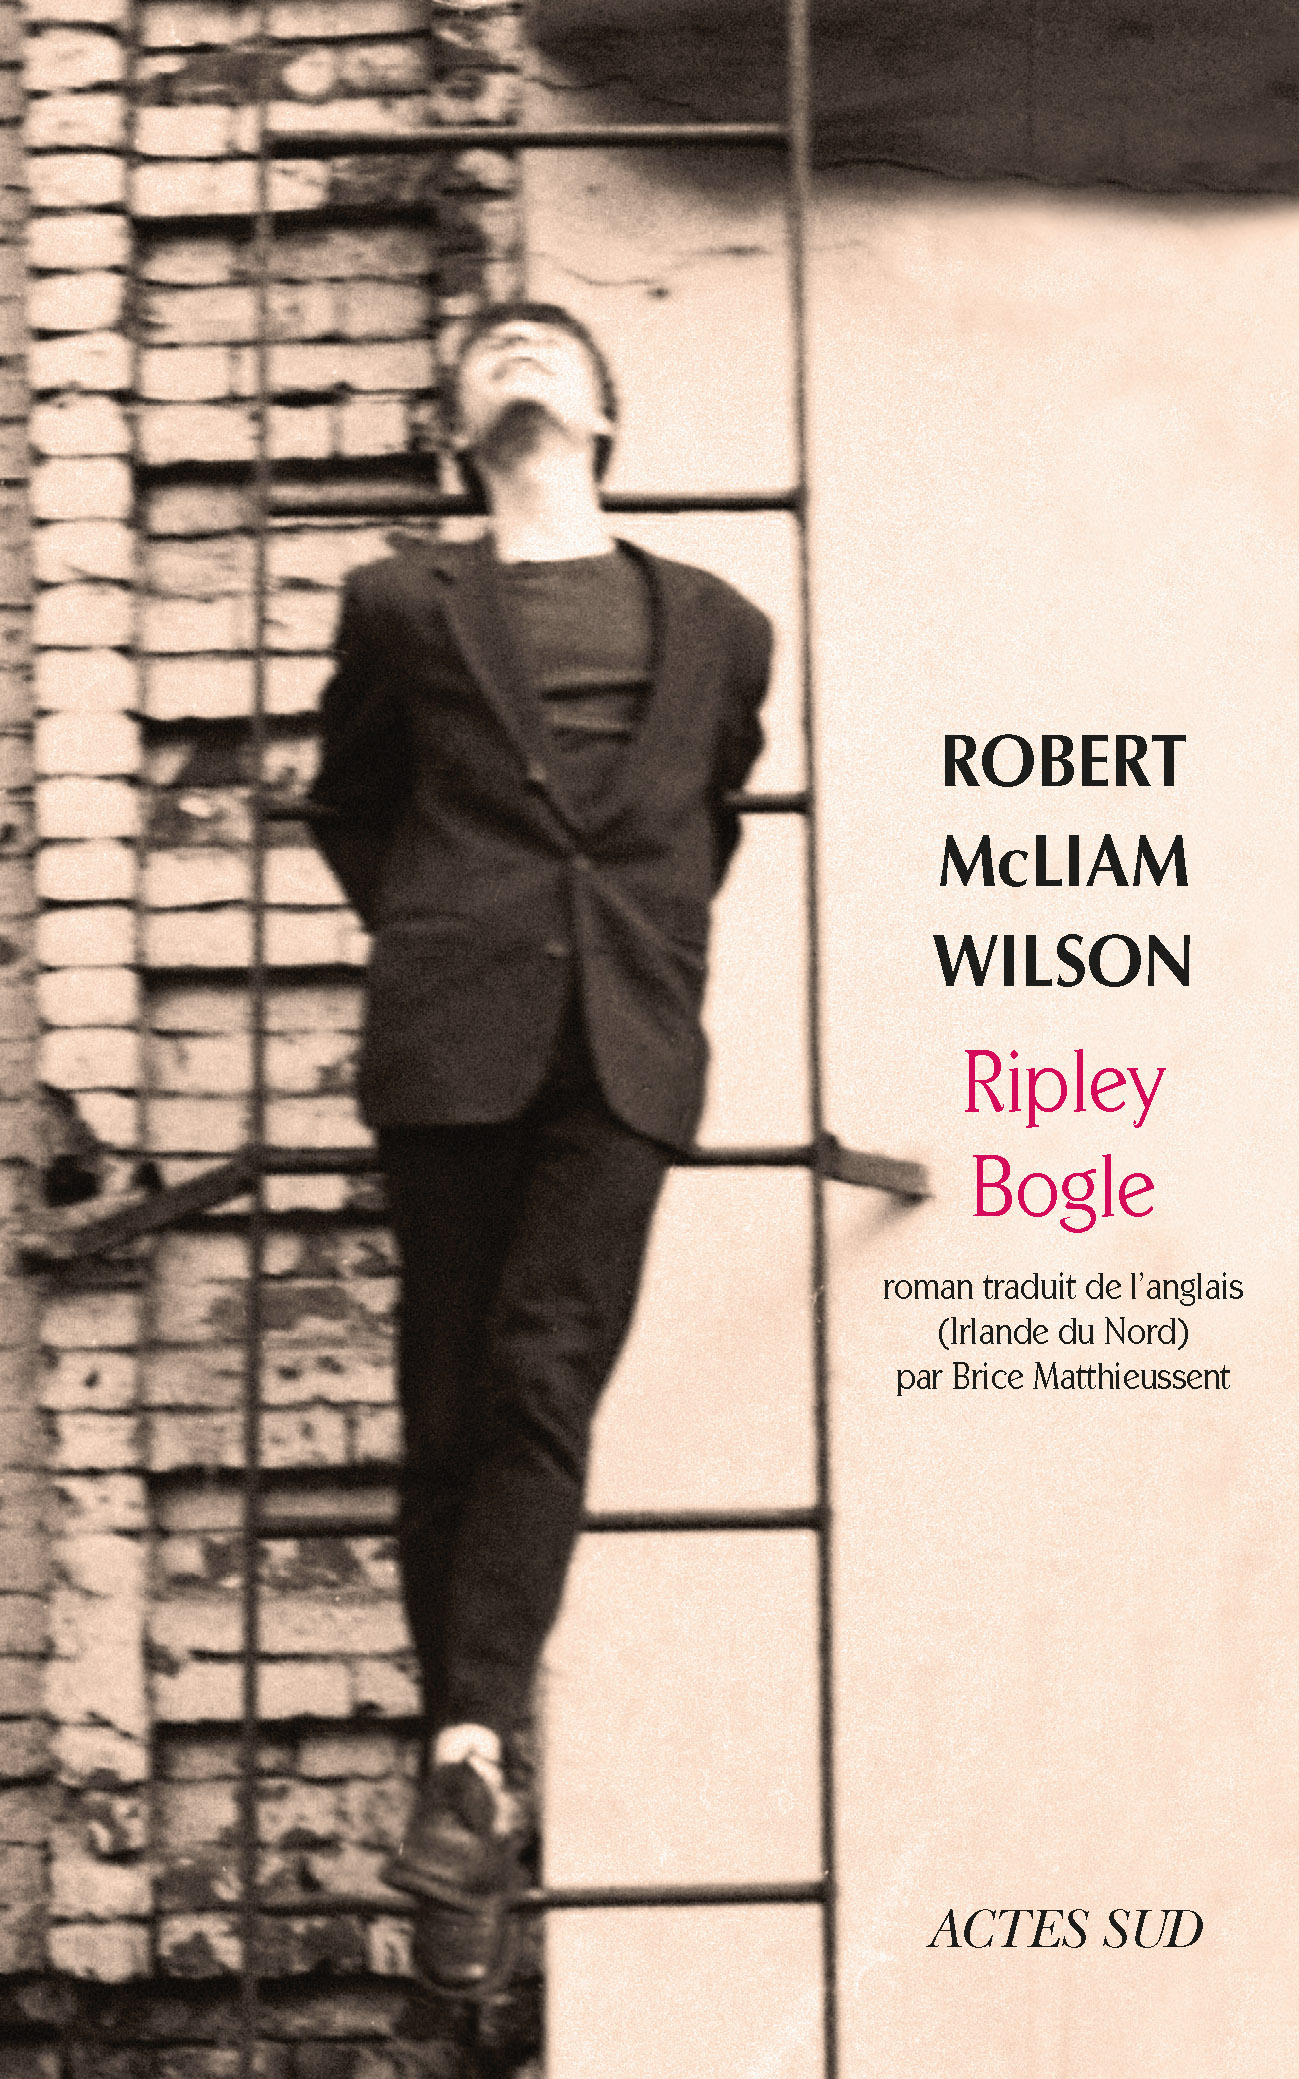 Ripley Bogle | Mcliam wilson, Robert